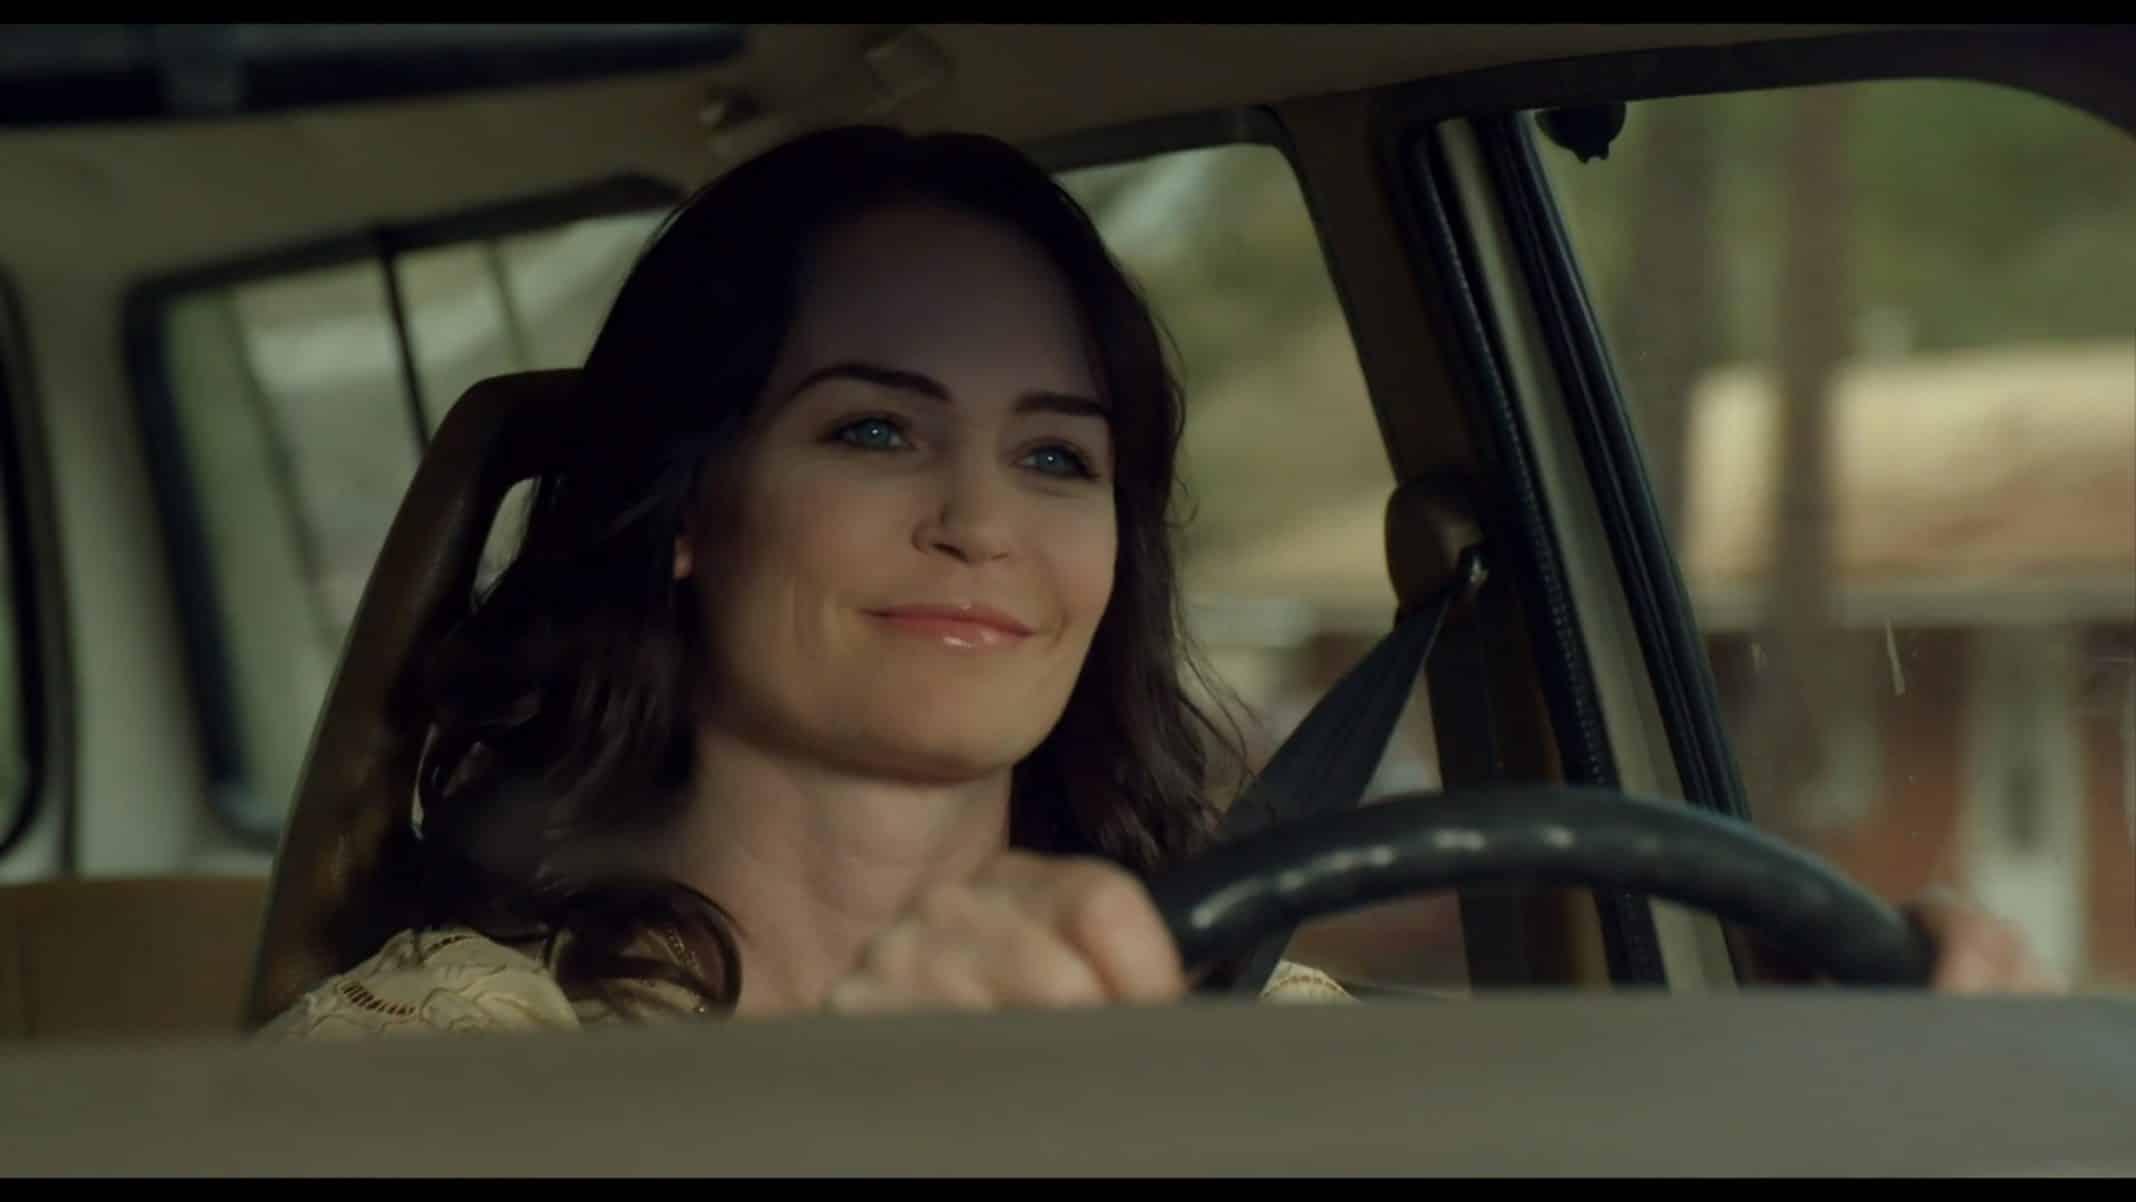 Frannie (Sprague Grayden) driving a car